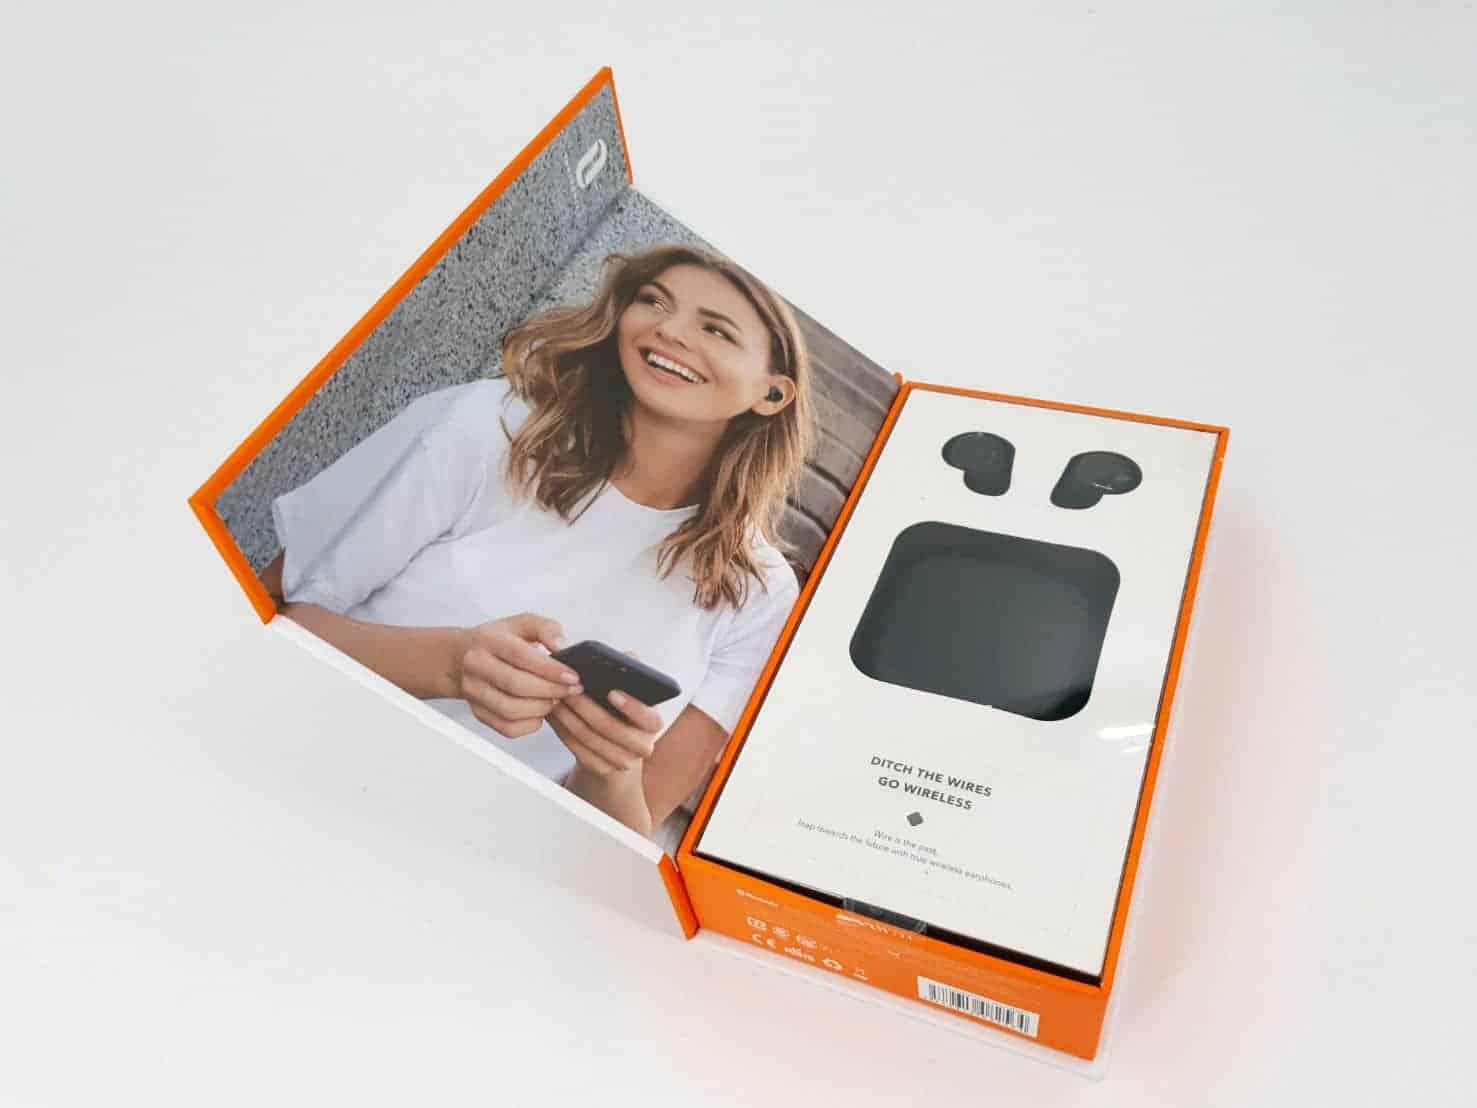 TaoTronics Duo Free平價真無線耳機推薦 內裝